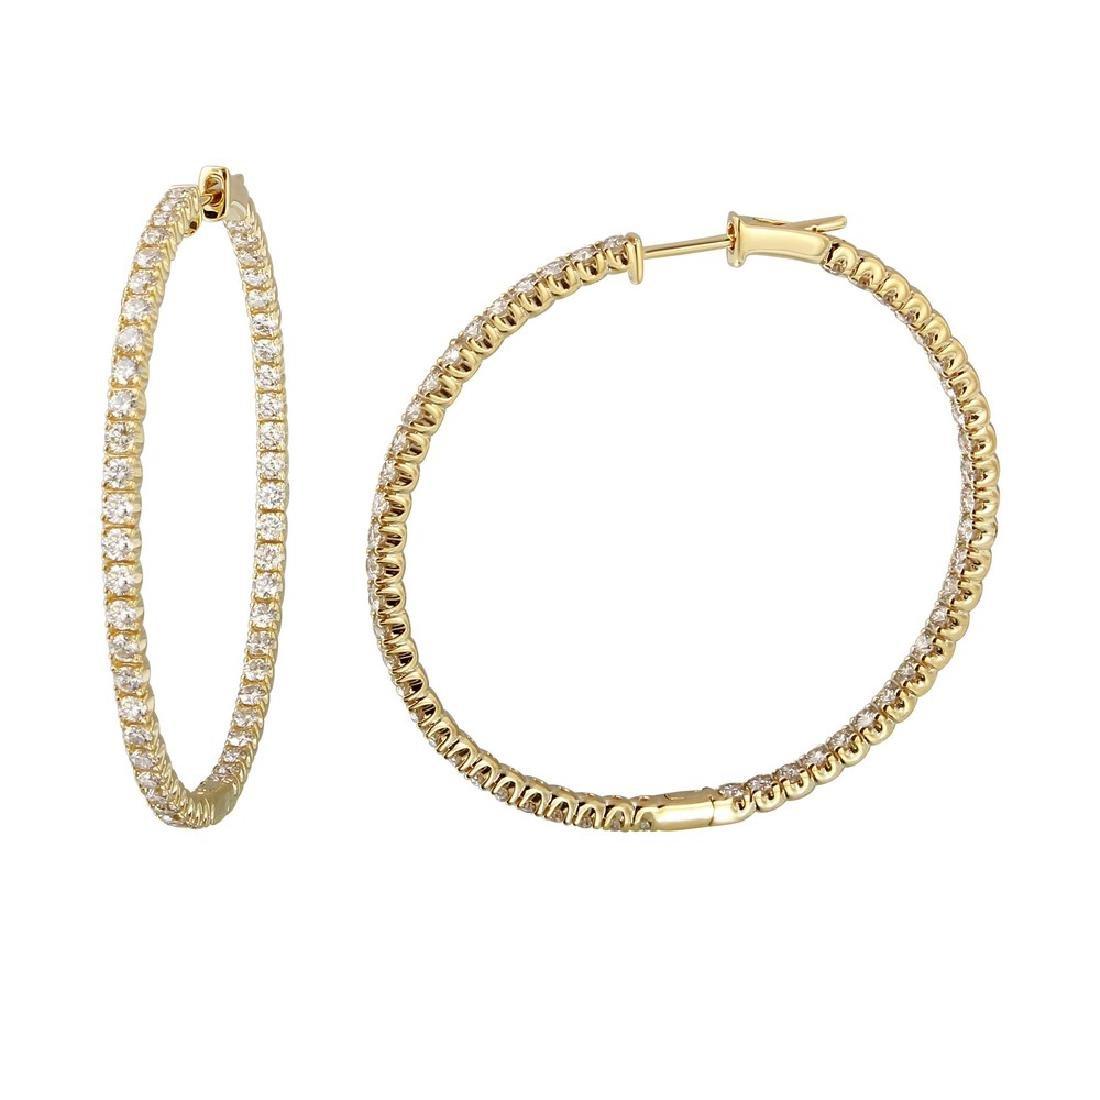 Genuine 2.75 TCW 14K Yellow Gold Ladies Earring